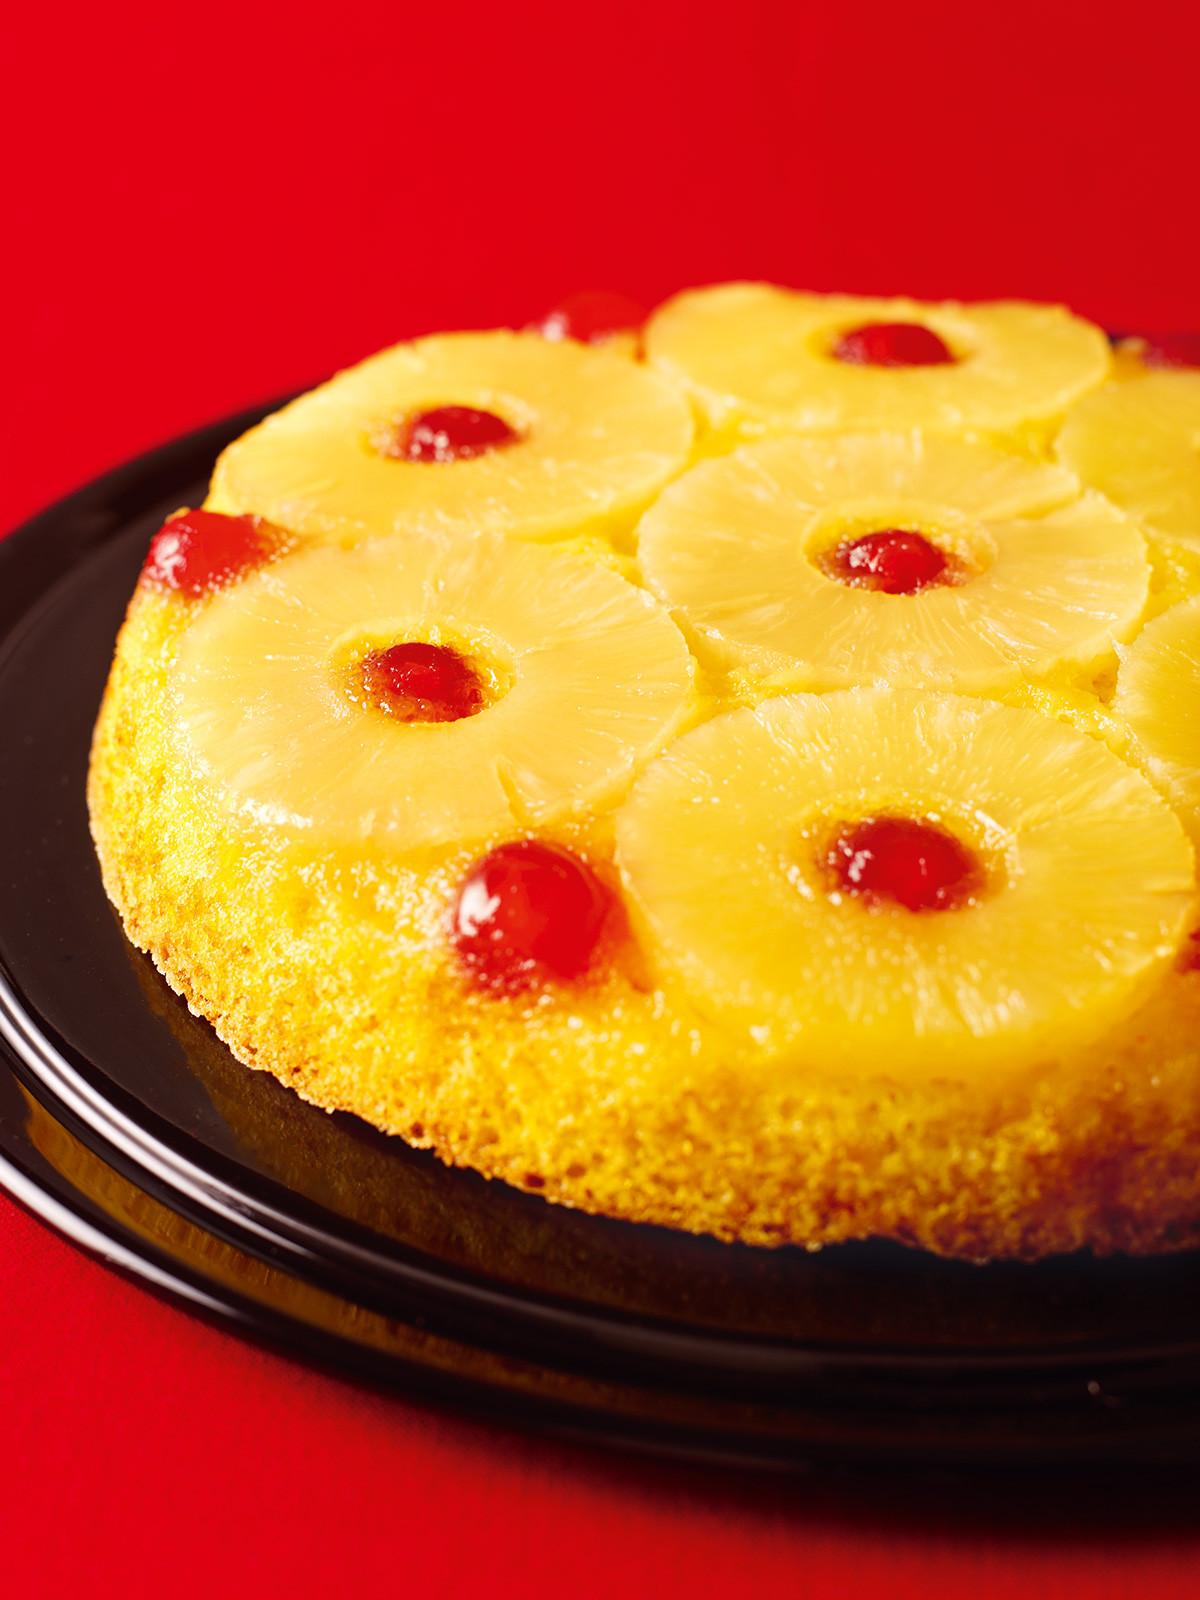 Pineapple Upside Down Cake Recipes  Pineapple Upside Down Cake Nigella s Recipes